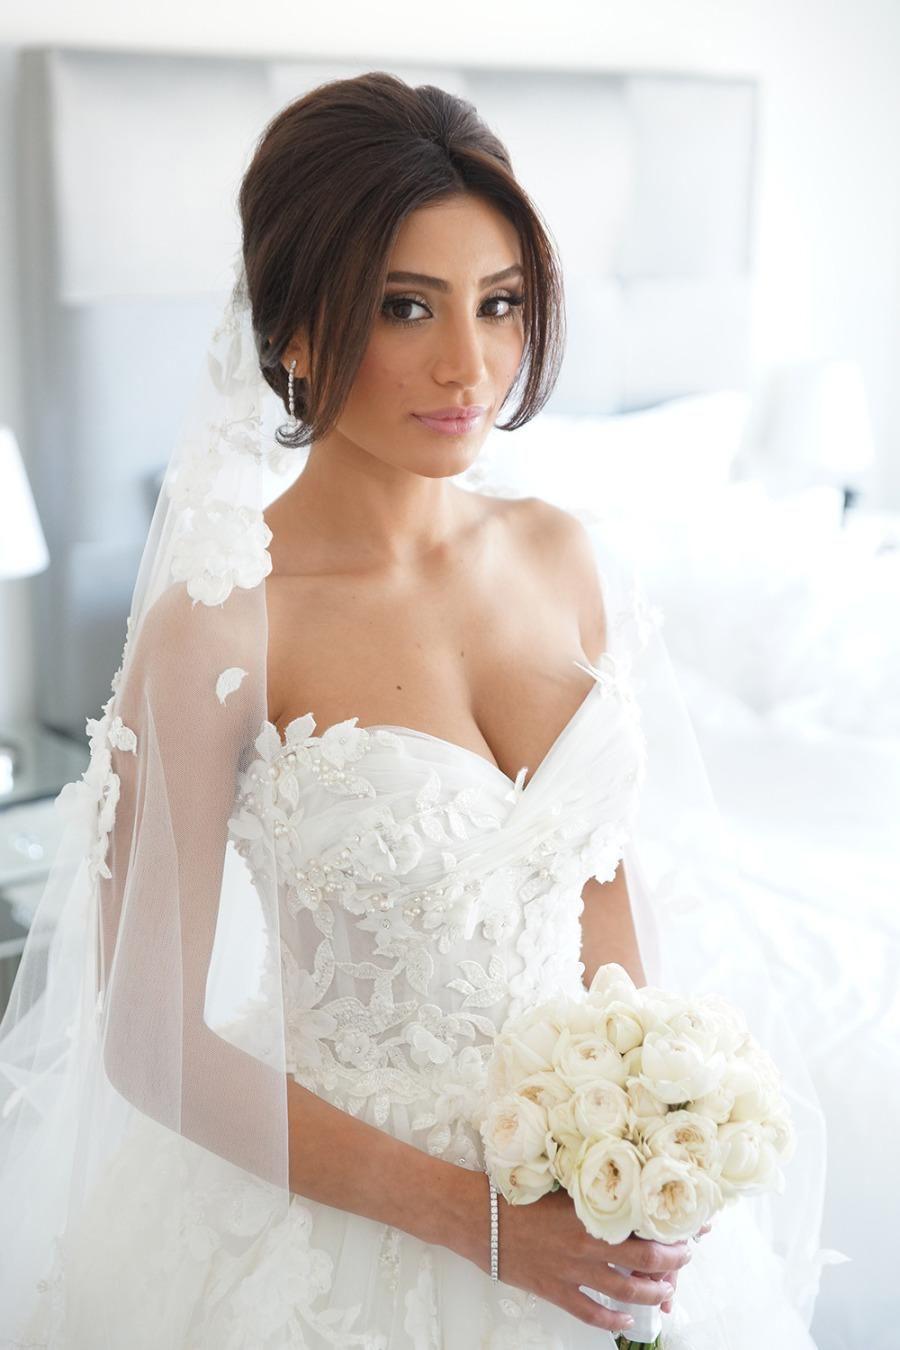 40+ Stunning Wedding Dresses 2014 2015 : Get Inspired Beautiful Real ...